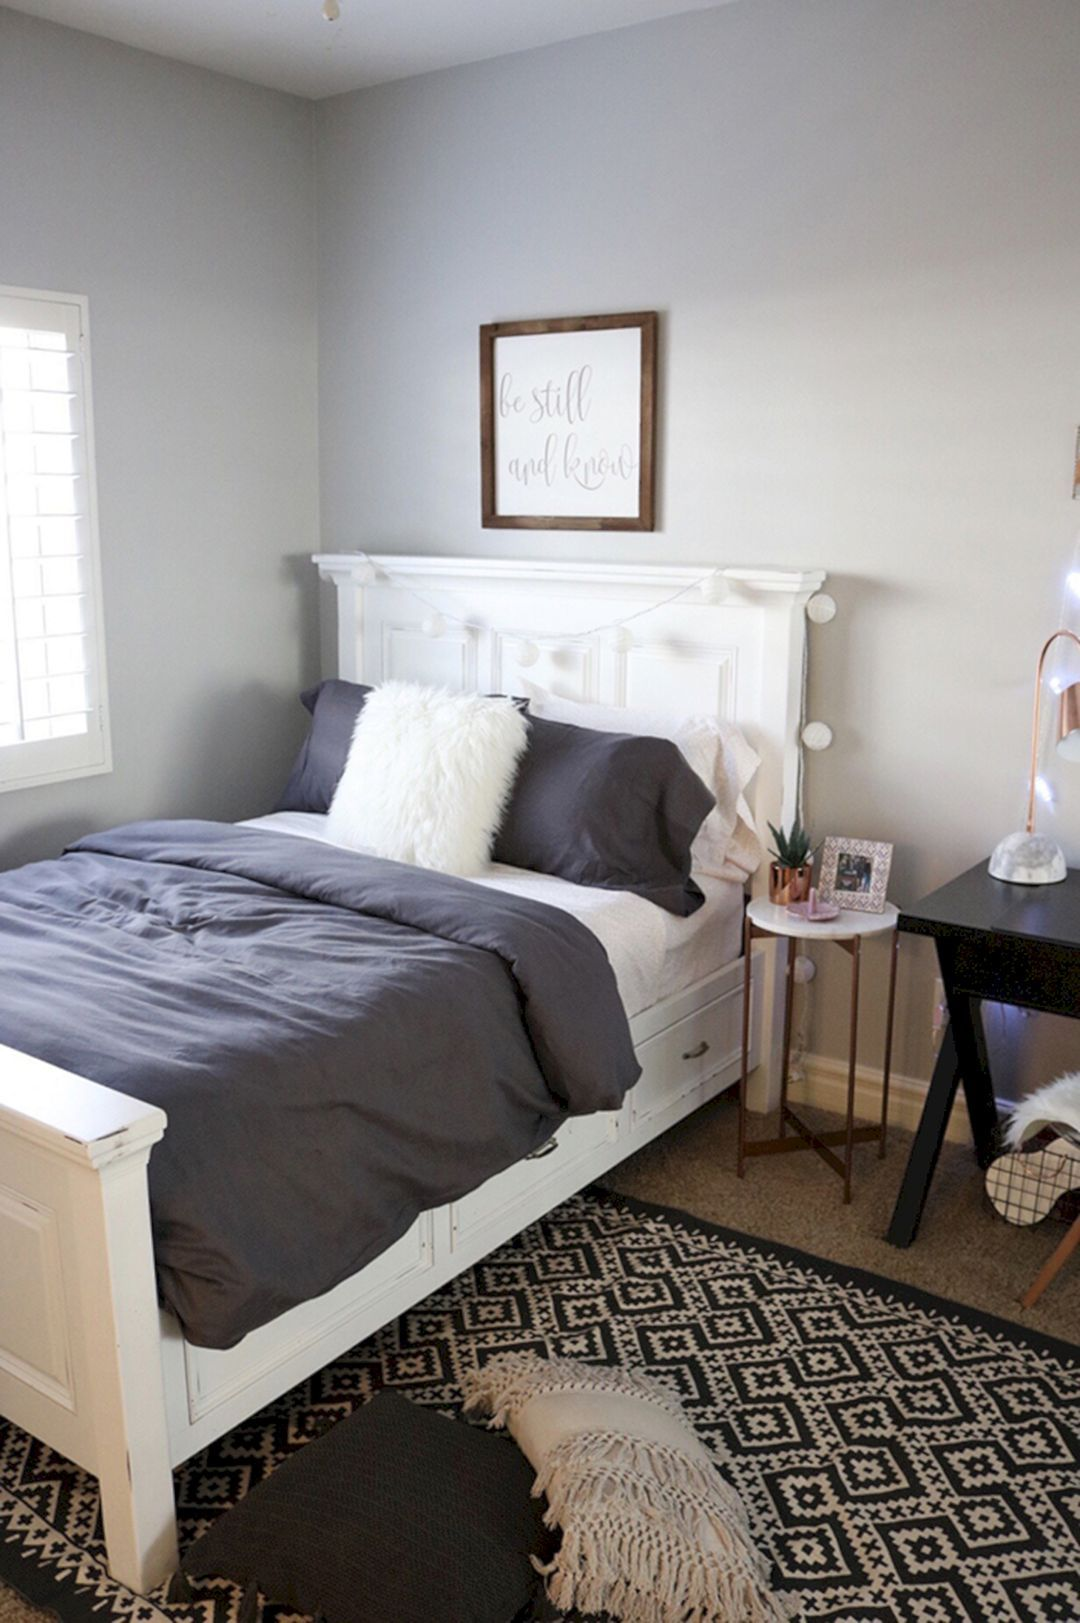 Stunning Modern Bedroom Color Scheme Ideas 40+ Best